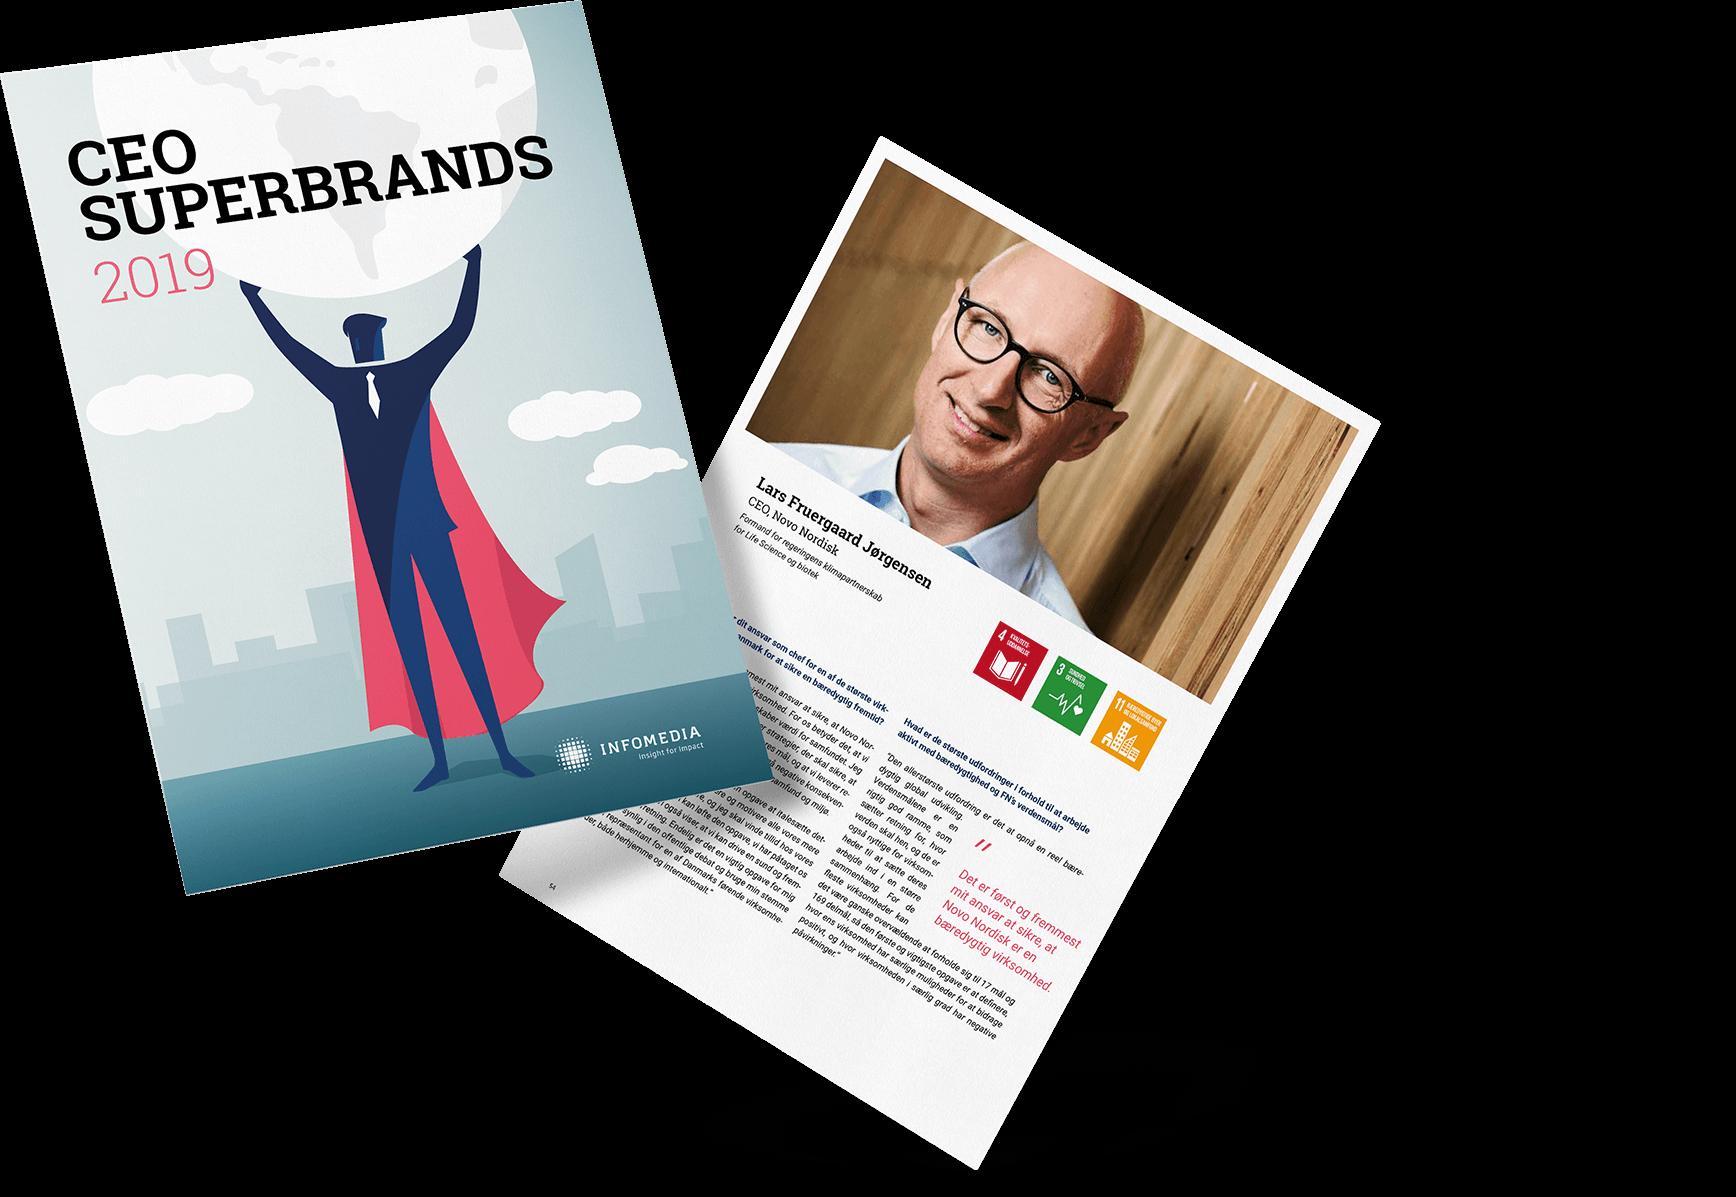 Infomedia CEO superbrands